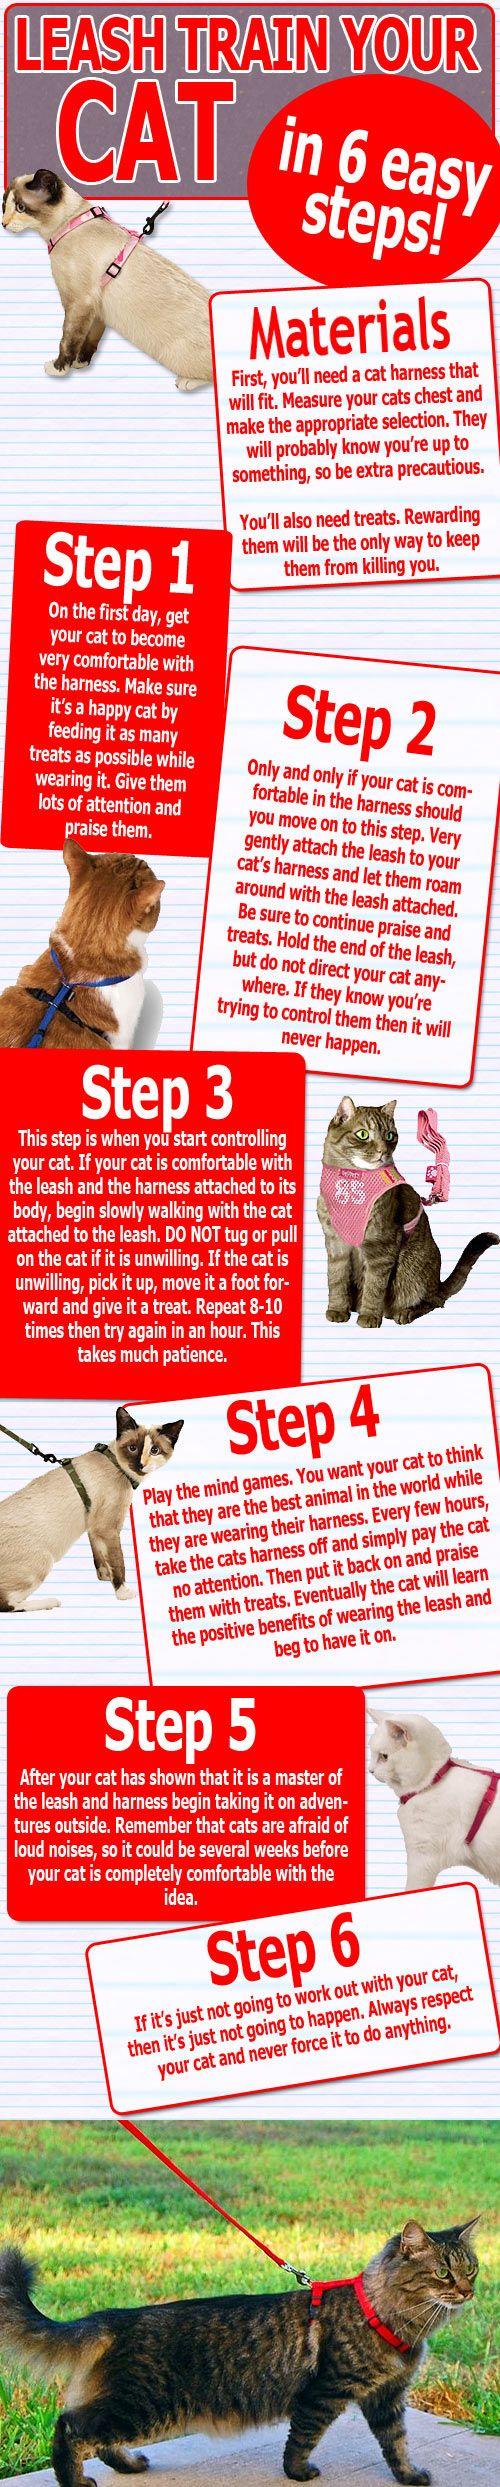 Leash Train A Cat 6 Easy Steps Cat Leash Crazy Cats Cat Training